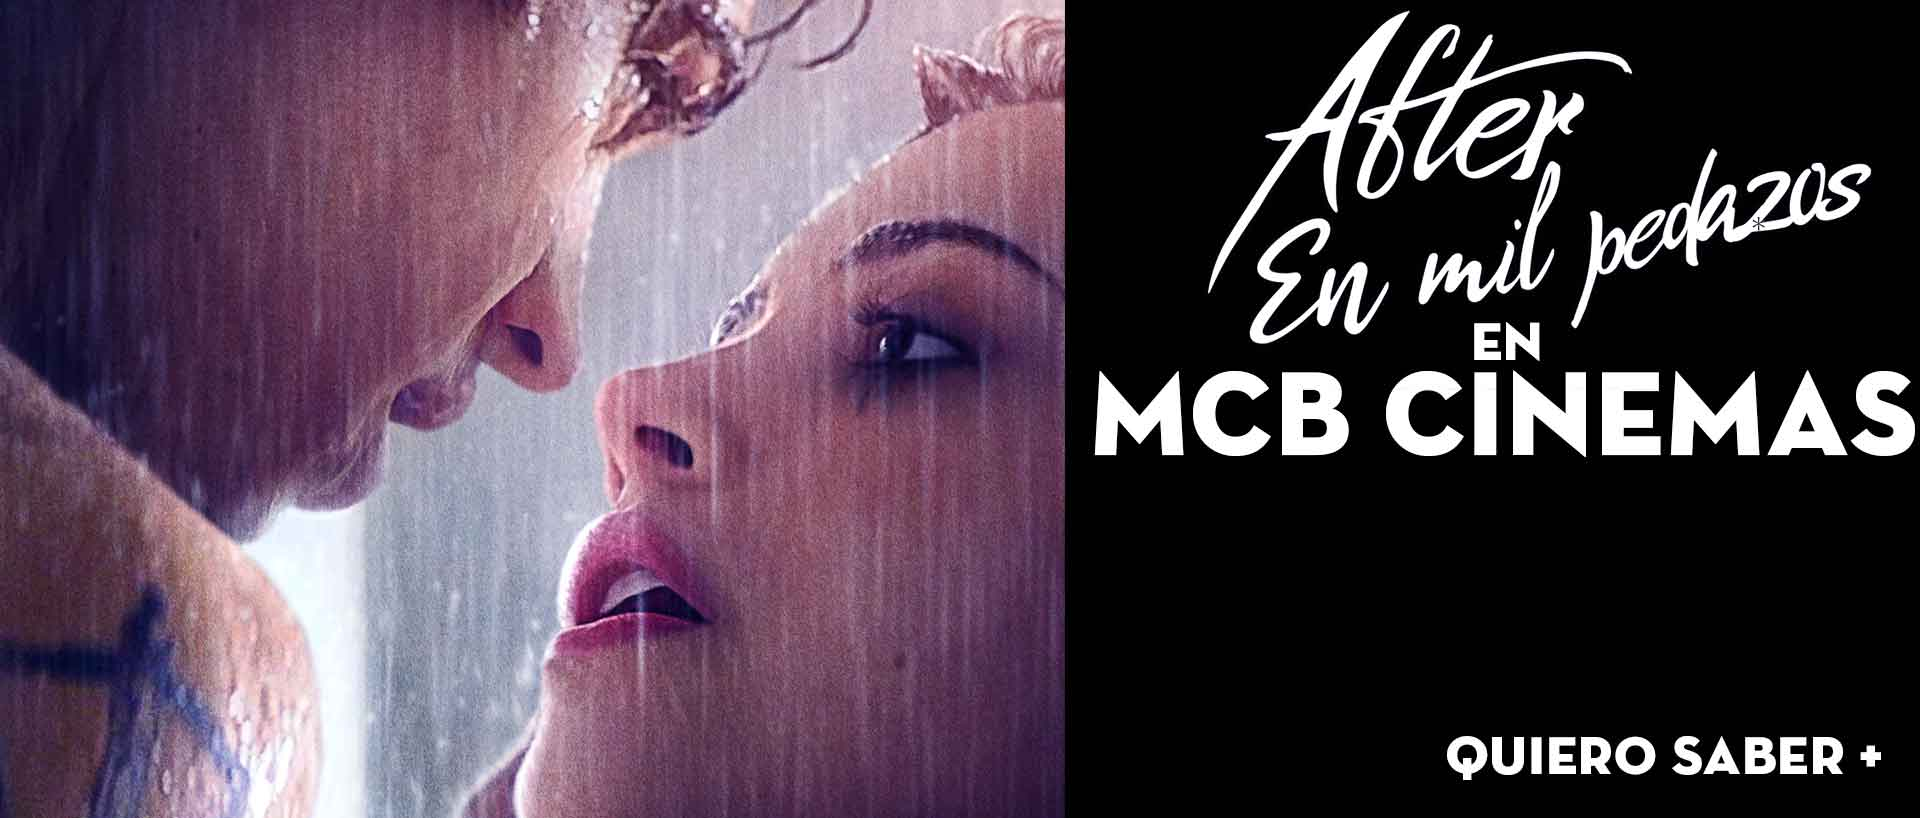 MCB--Promo-after.jpg